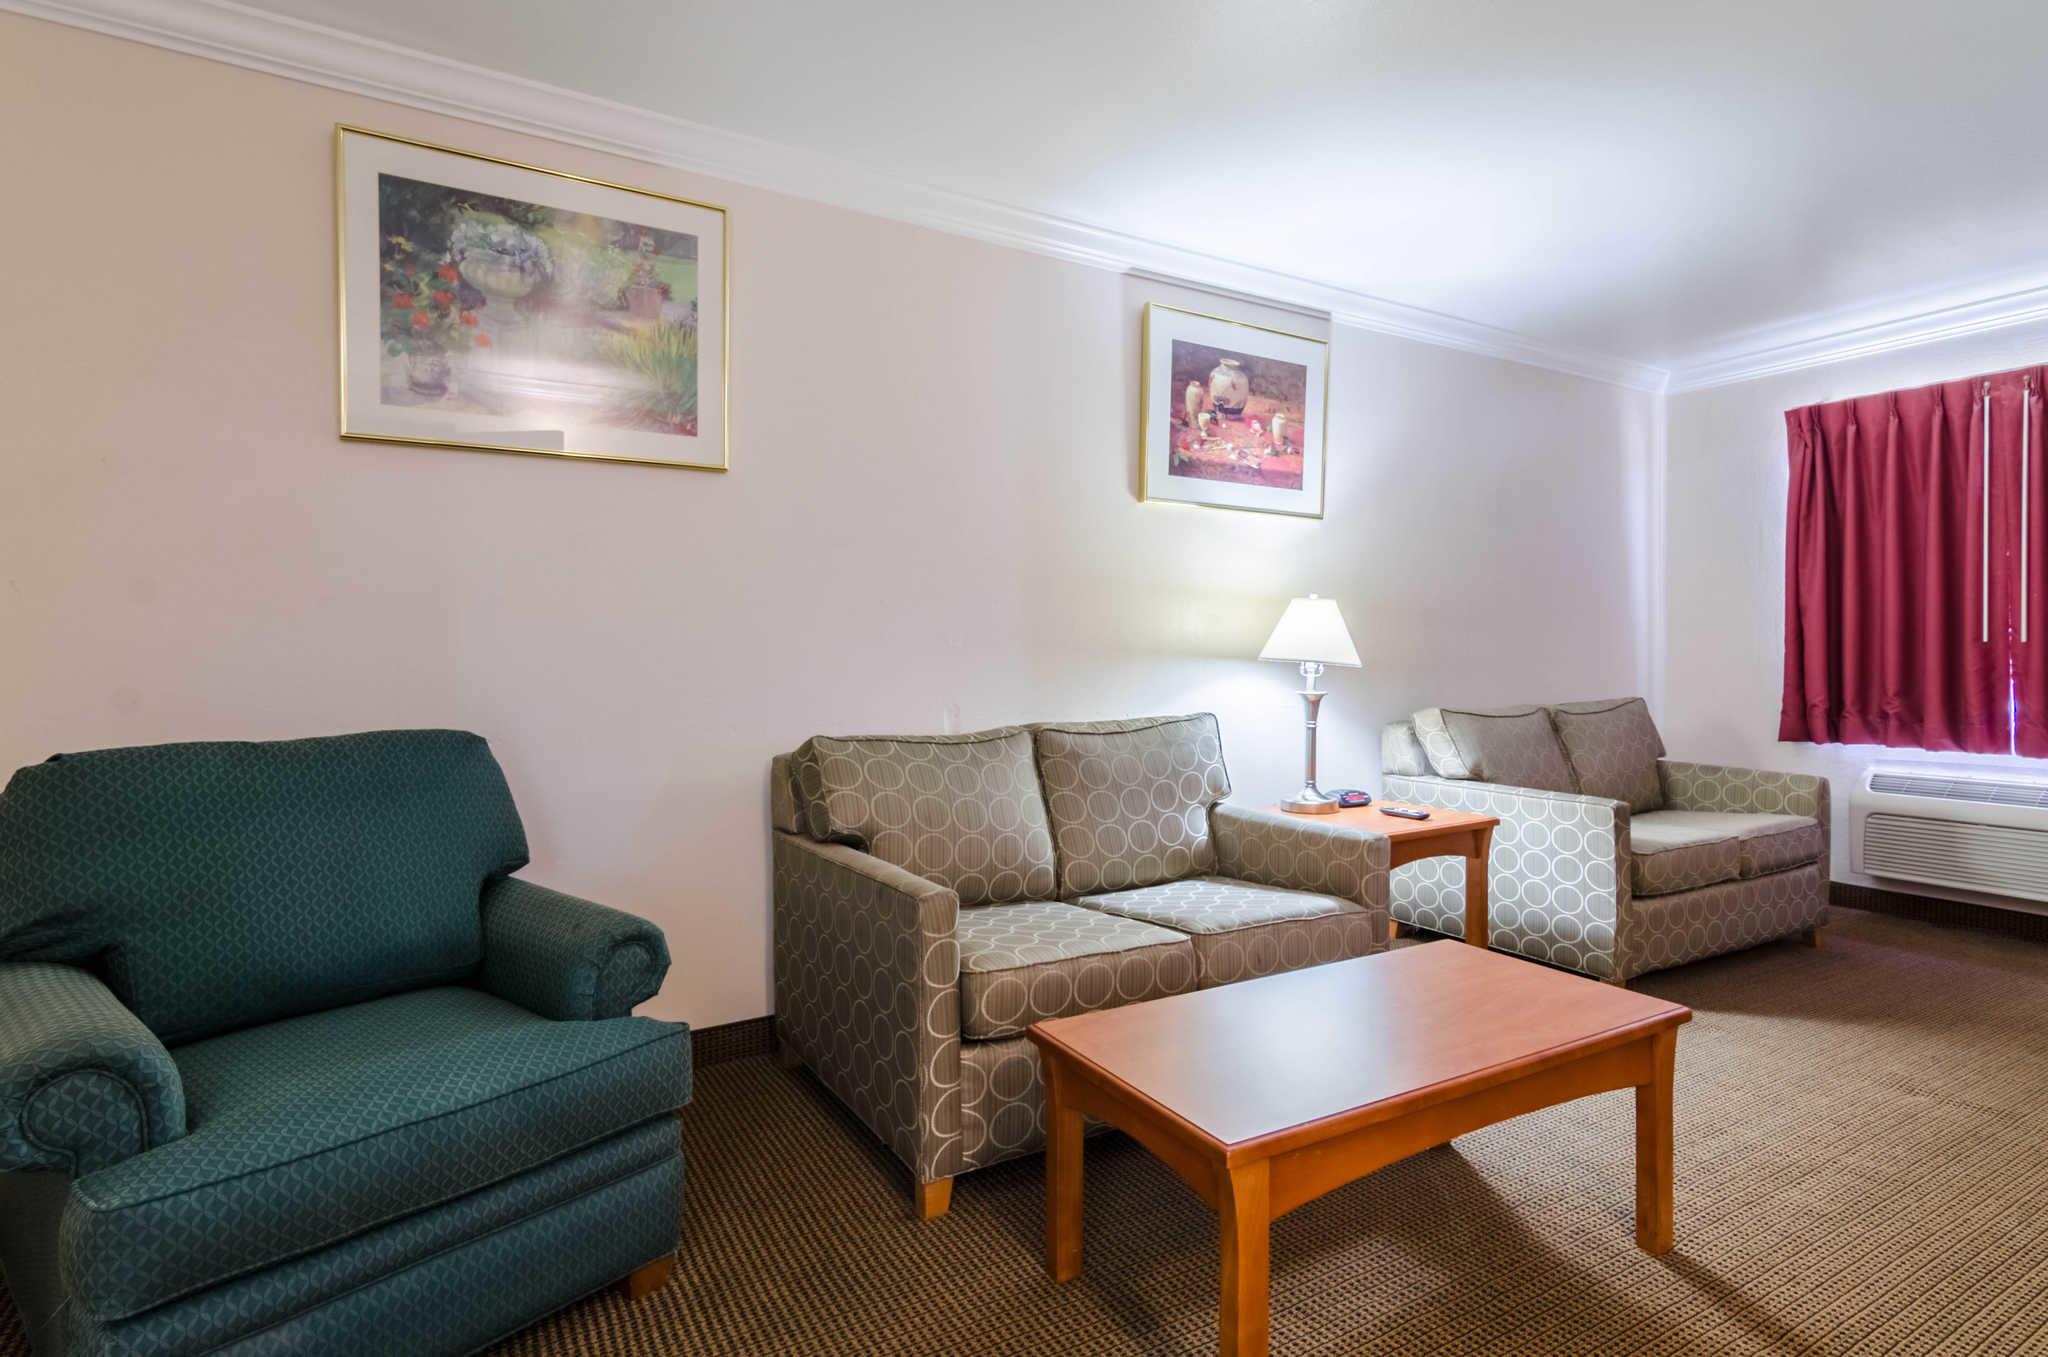 Quality Inn & Suites image 46